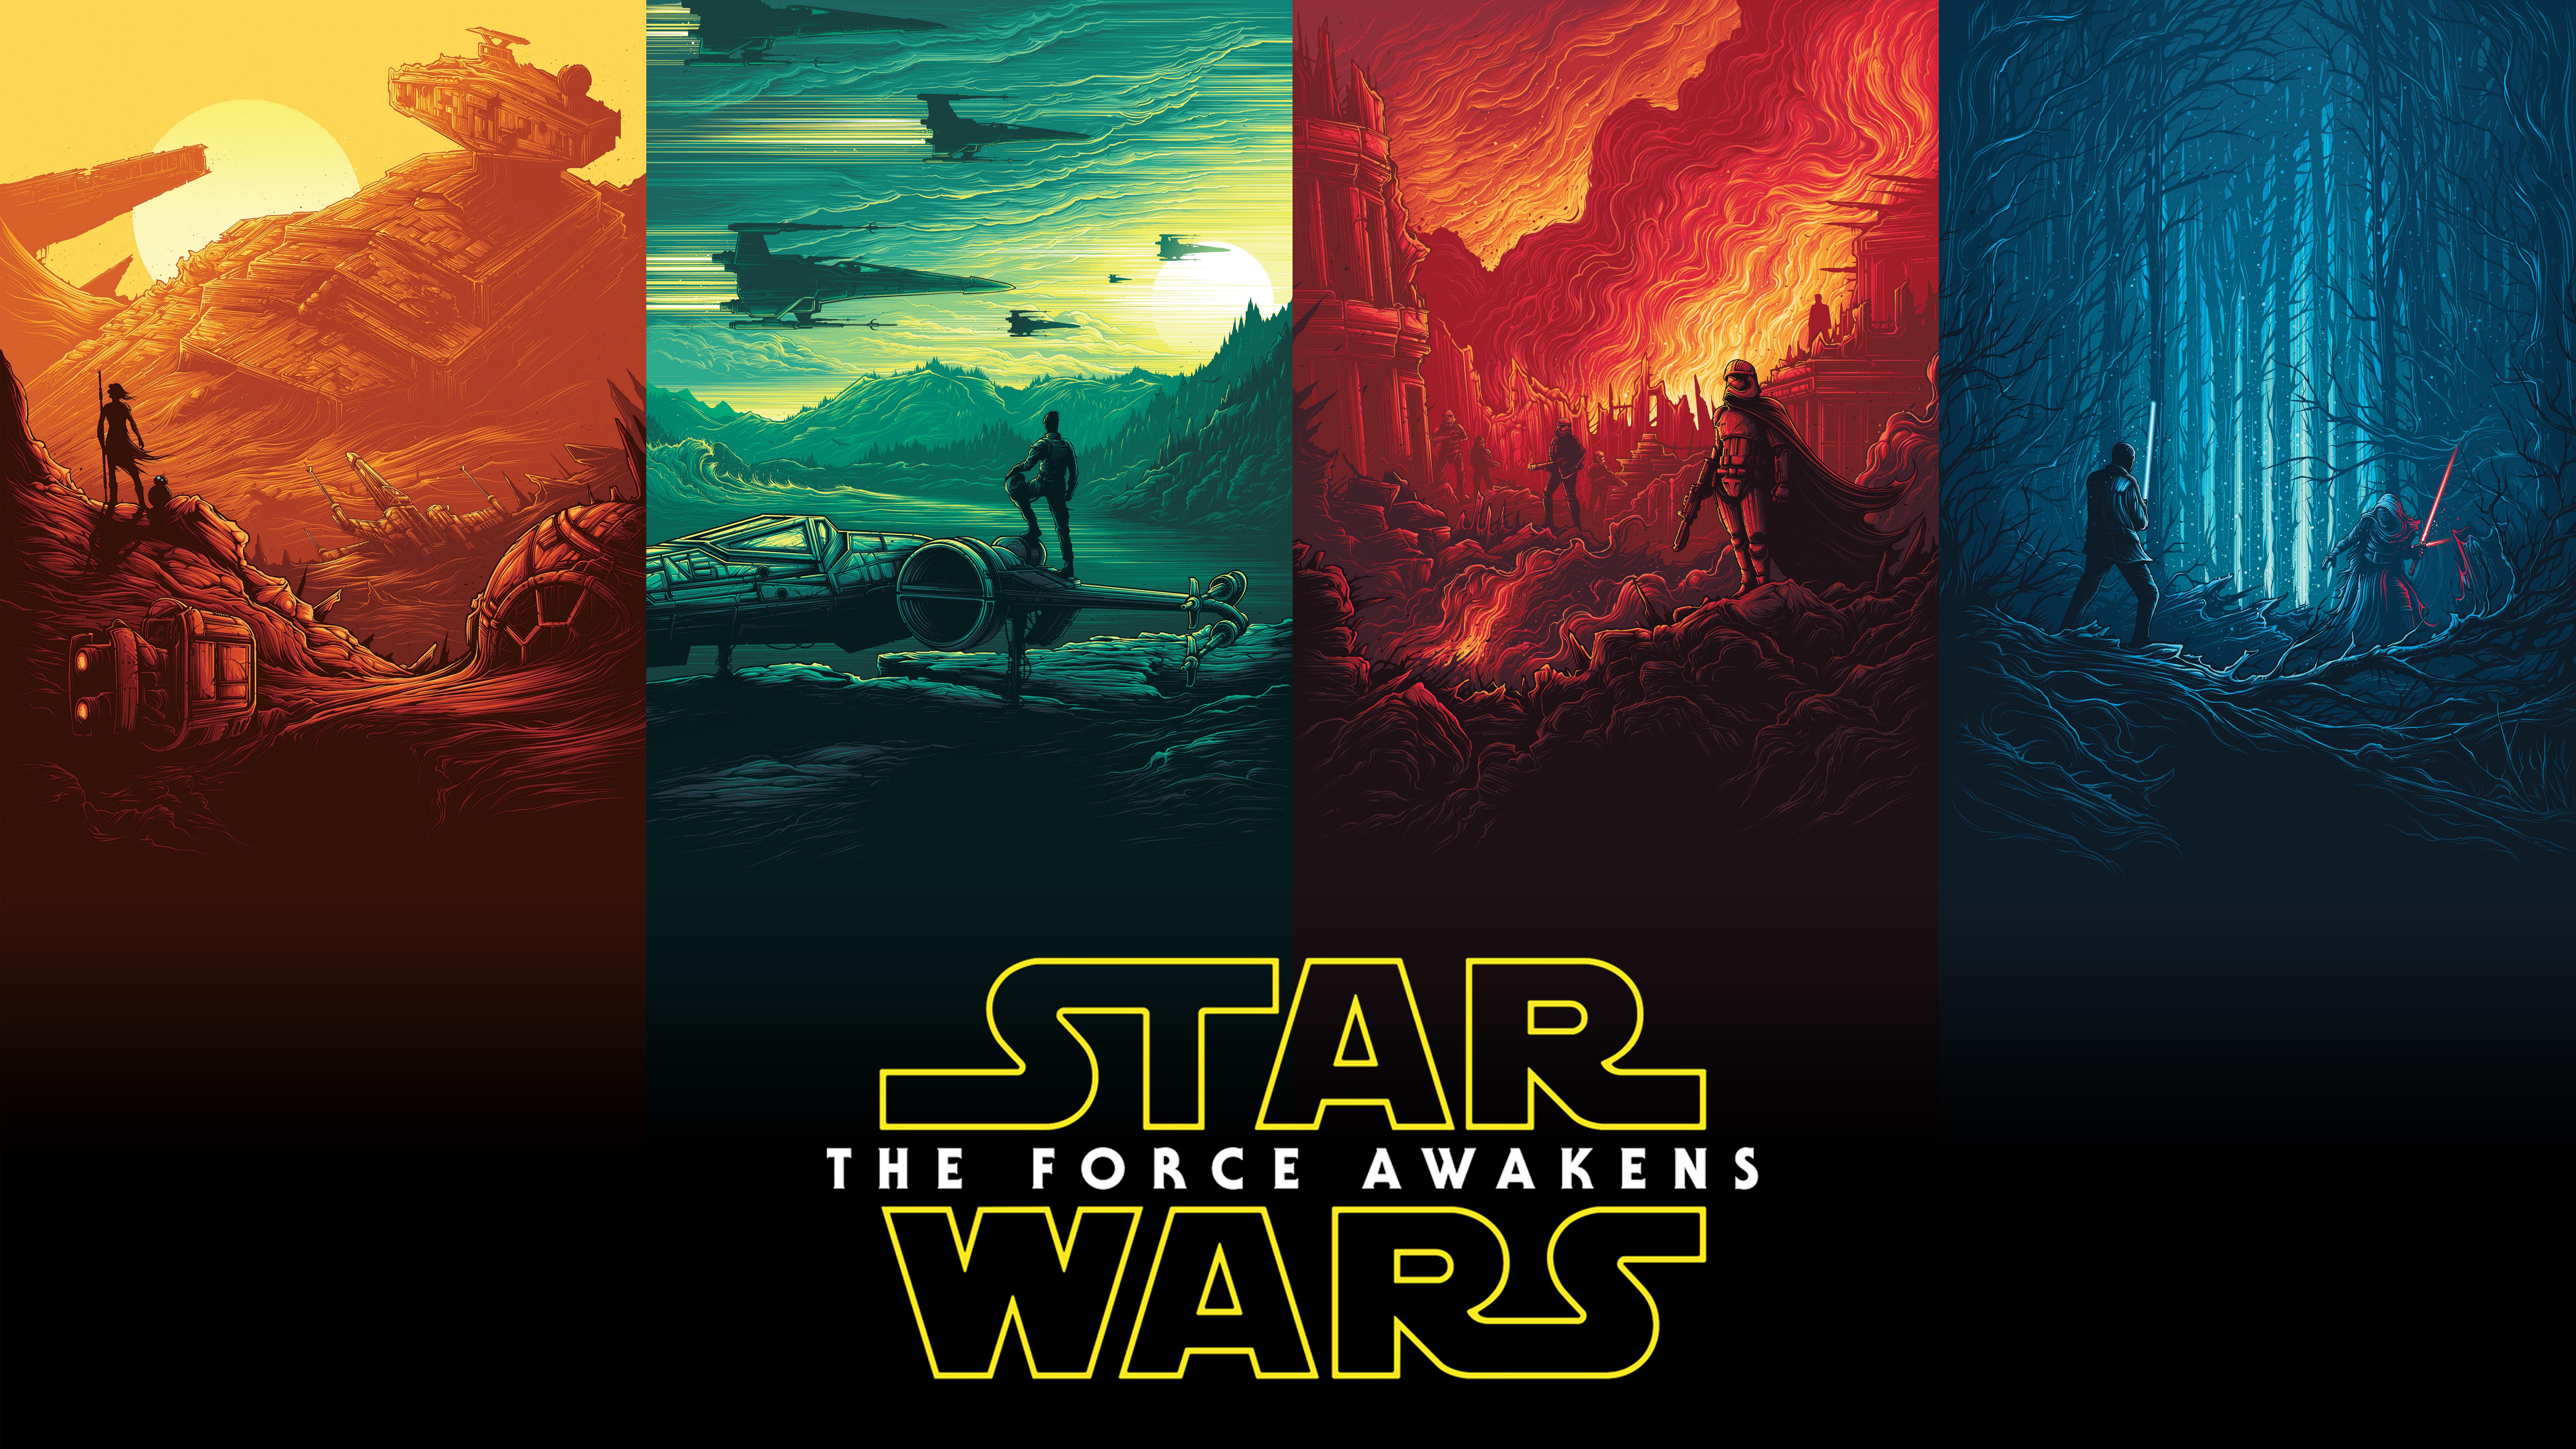 7680x4320 Star Wars Poster Logo 8k Hd 4k Wallpapers Images